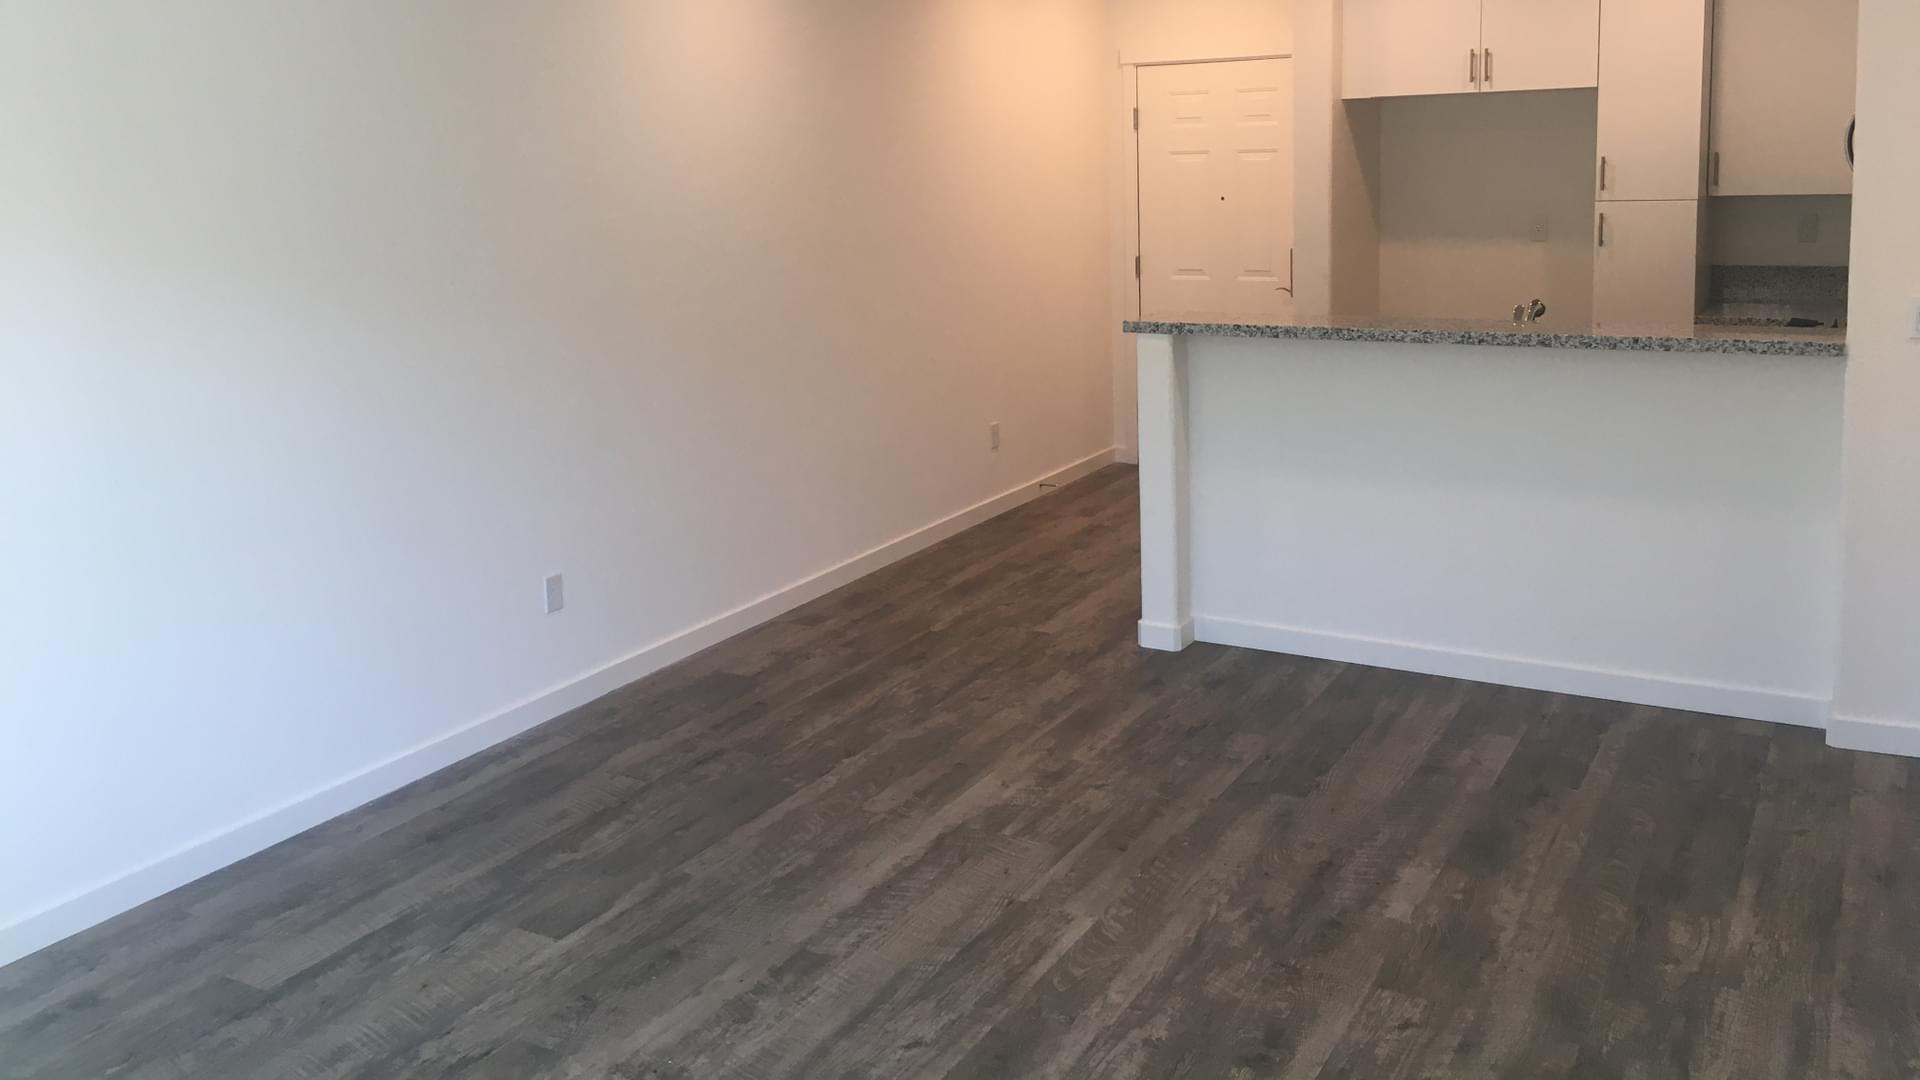 Unit 3302 Kitchen & Living Room